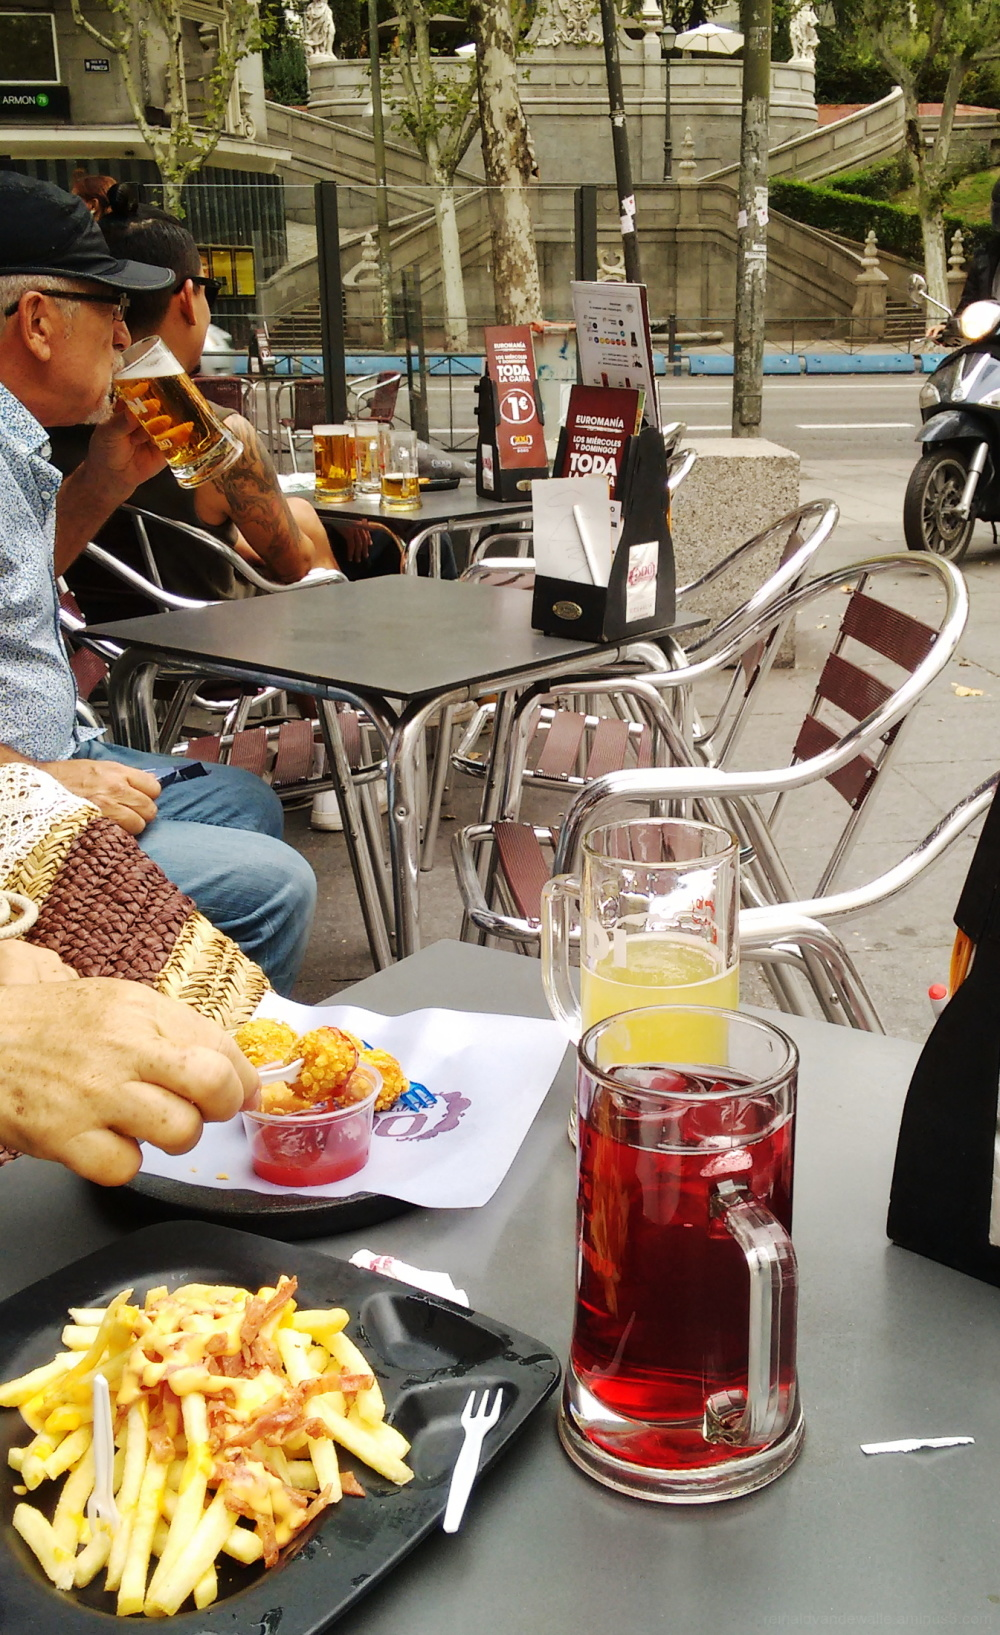 Enjoying a drink on the street